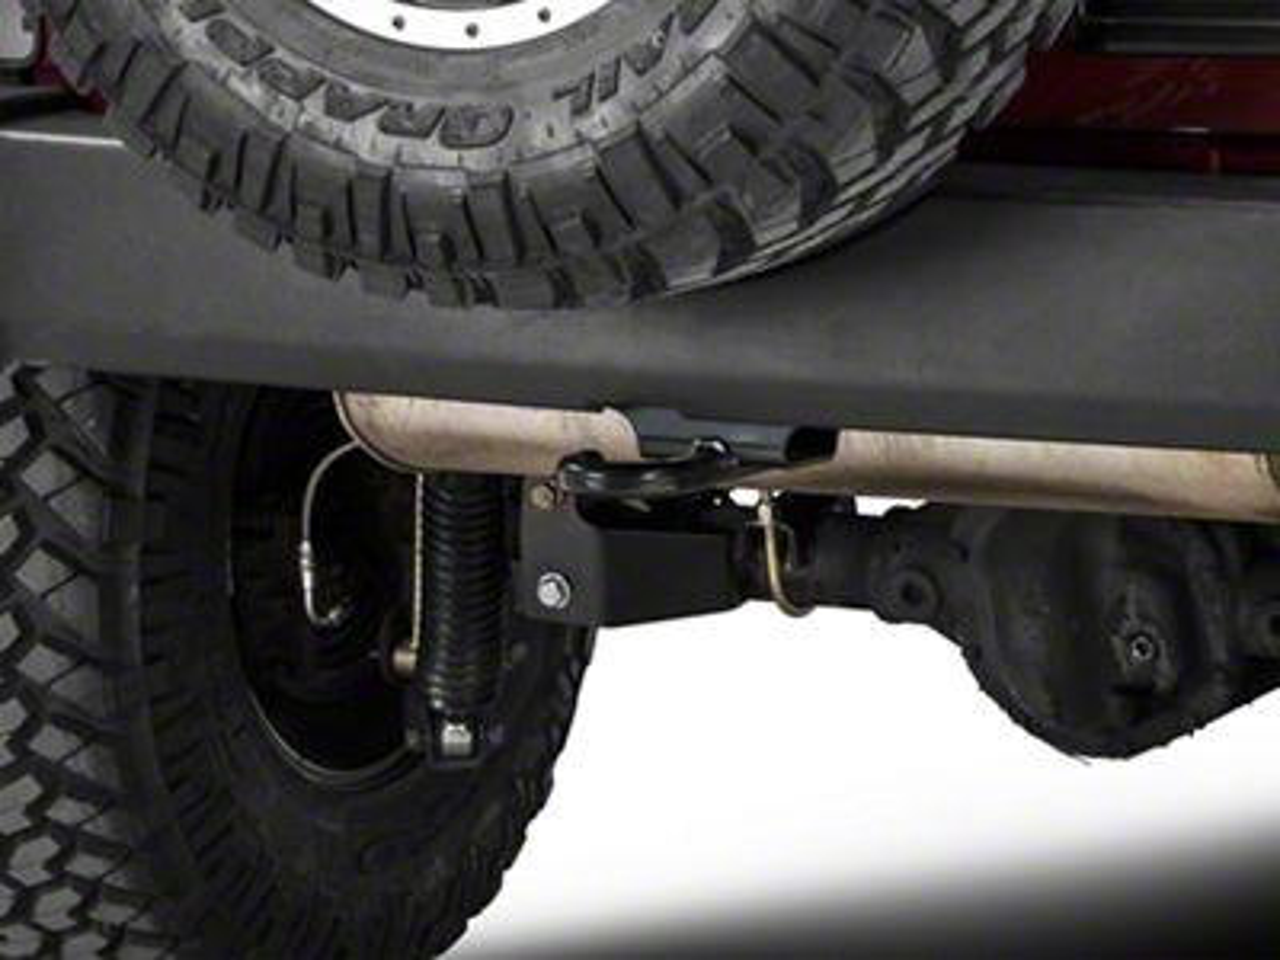 Mopar Tow Hook (07-19 Jeep Wrangler JK & JL)